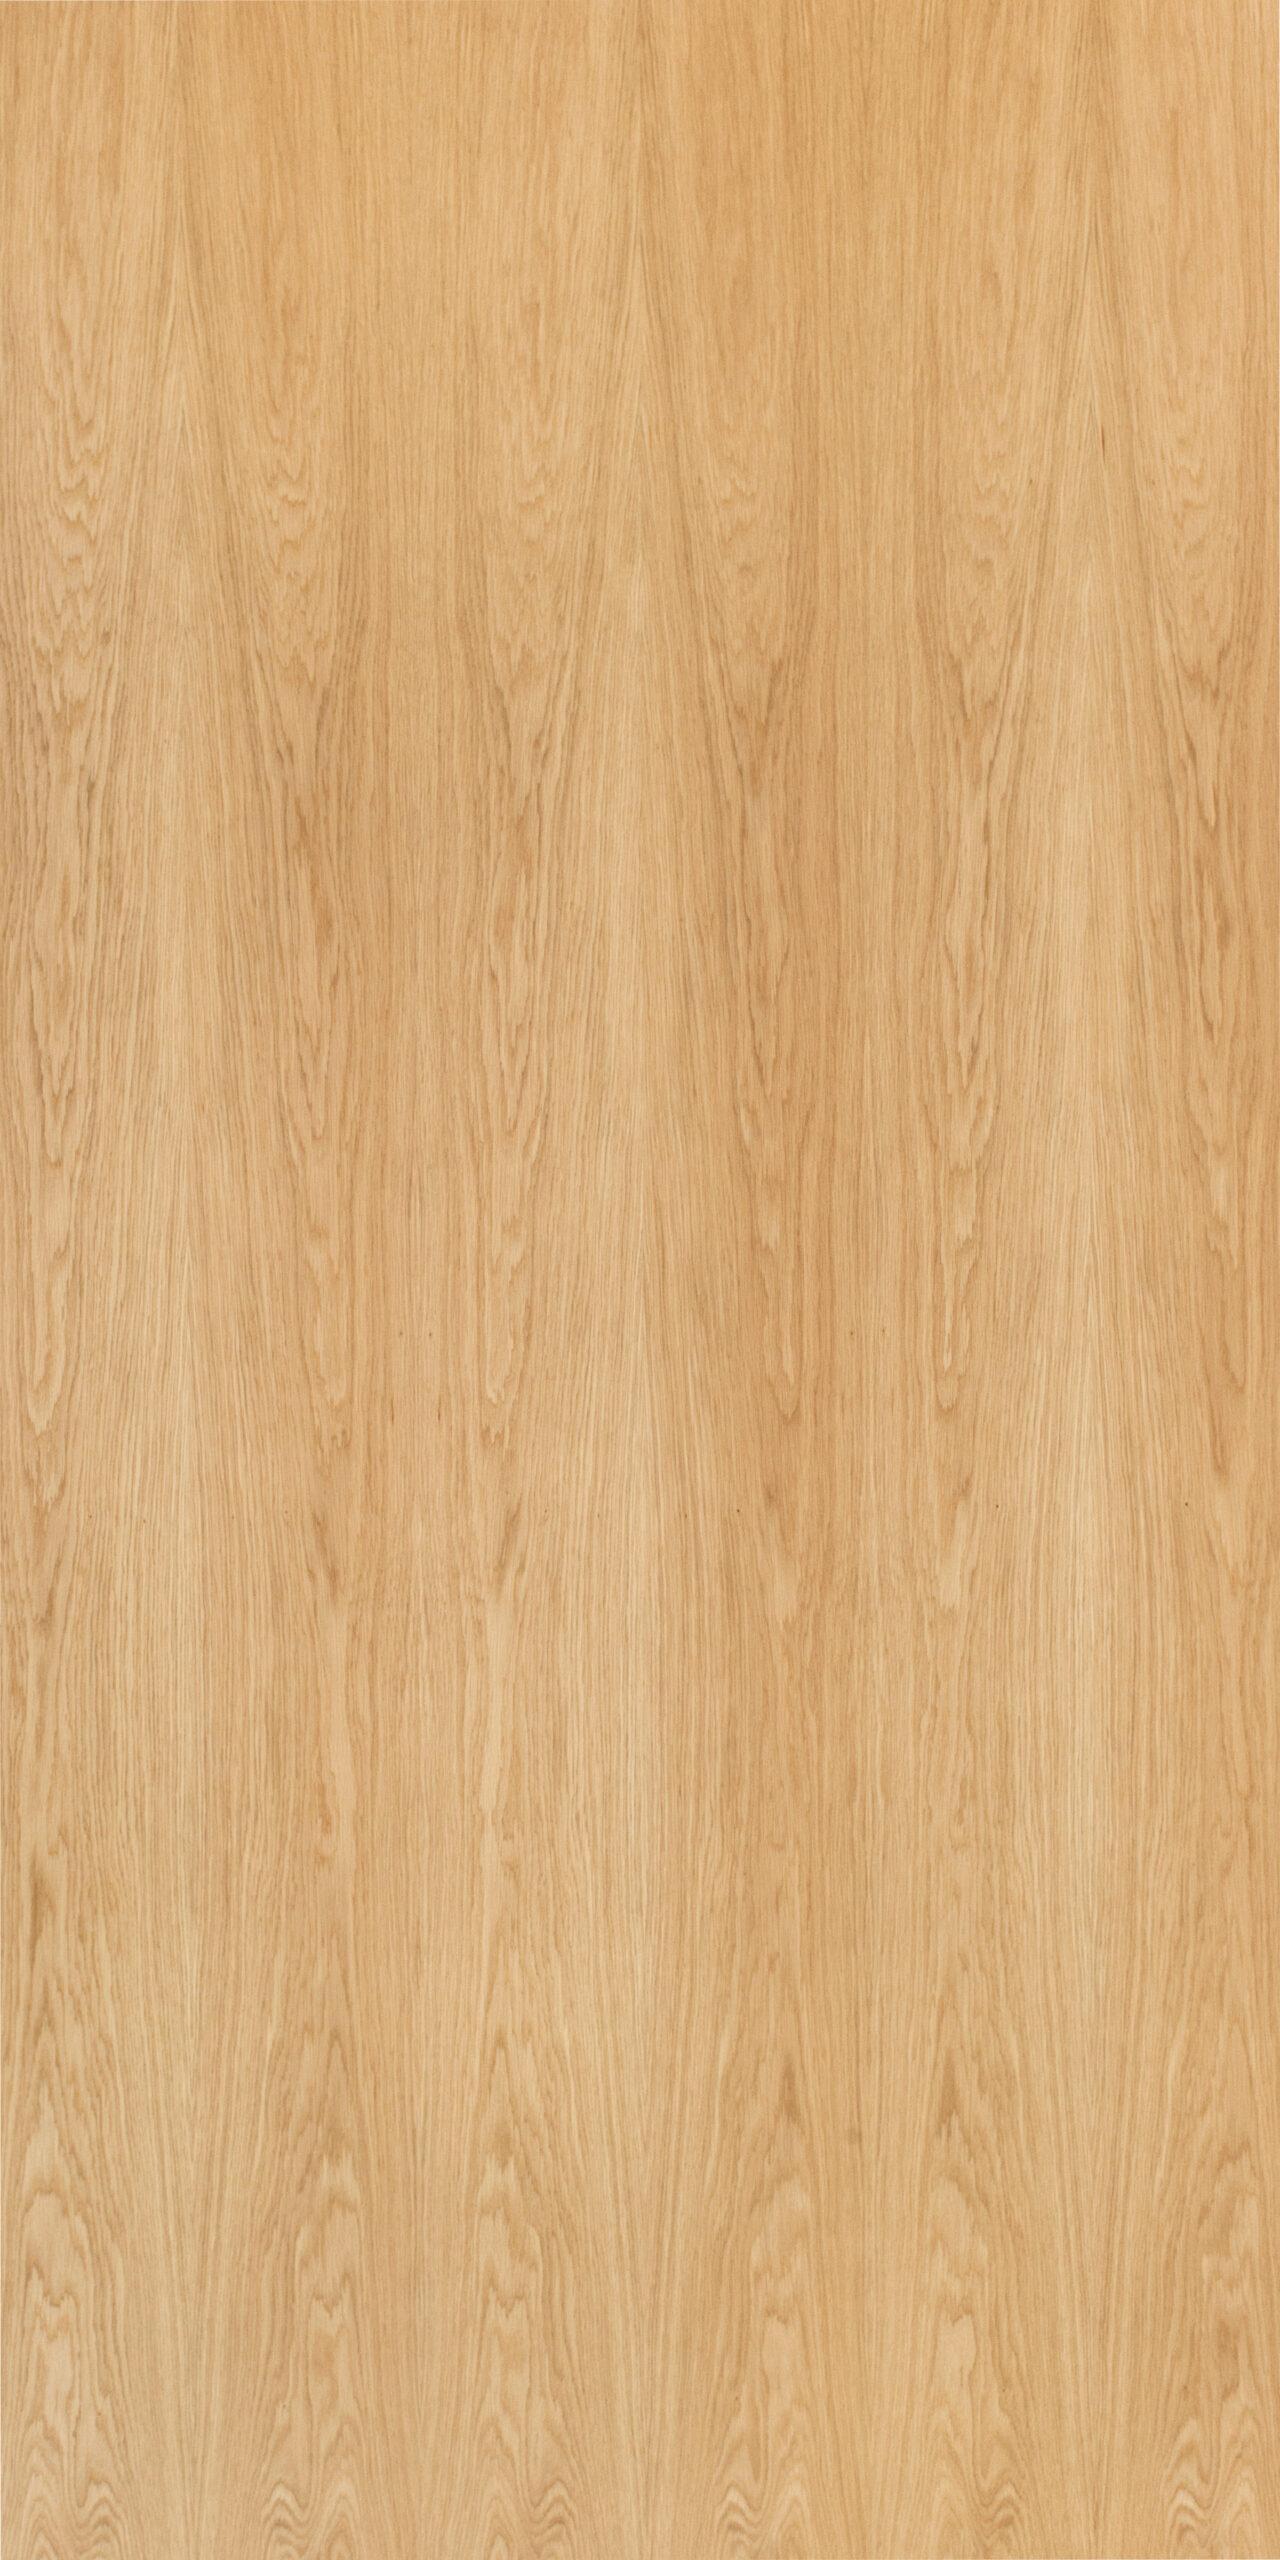 European Oak Crown Cut Natural Veneer